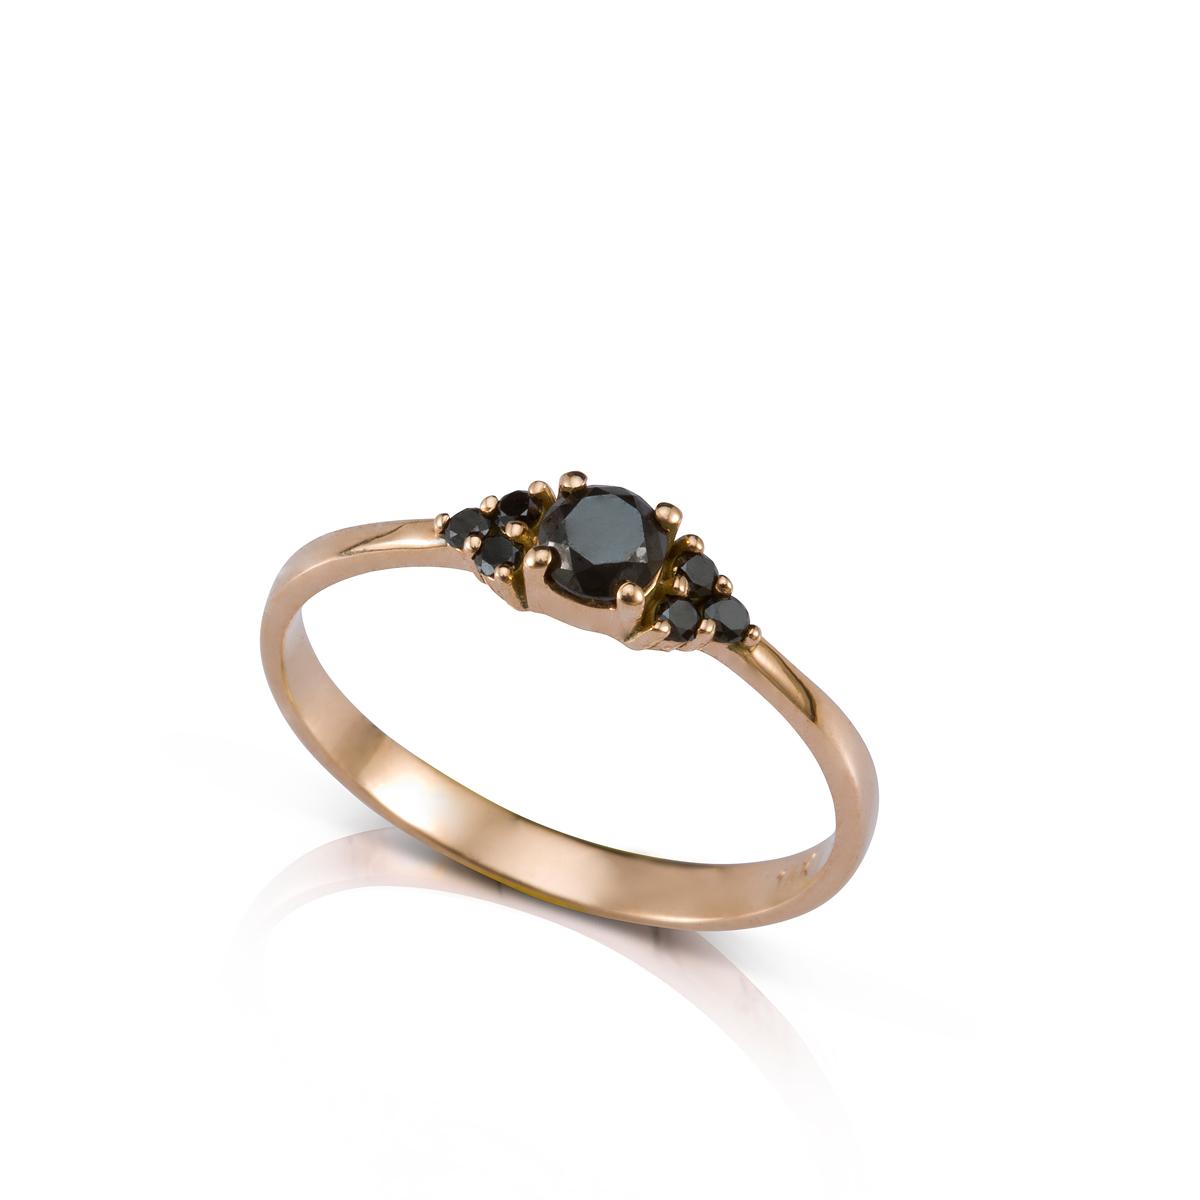 25 pts center black diamond and 6 side black diamonds ring